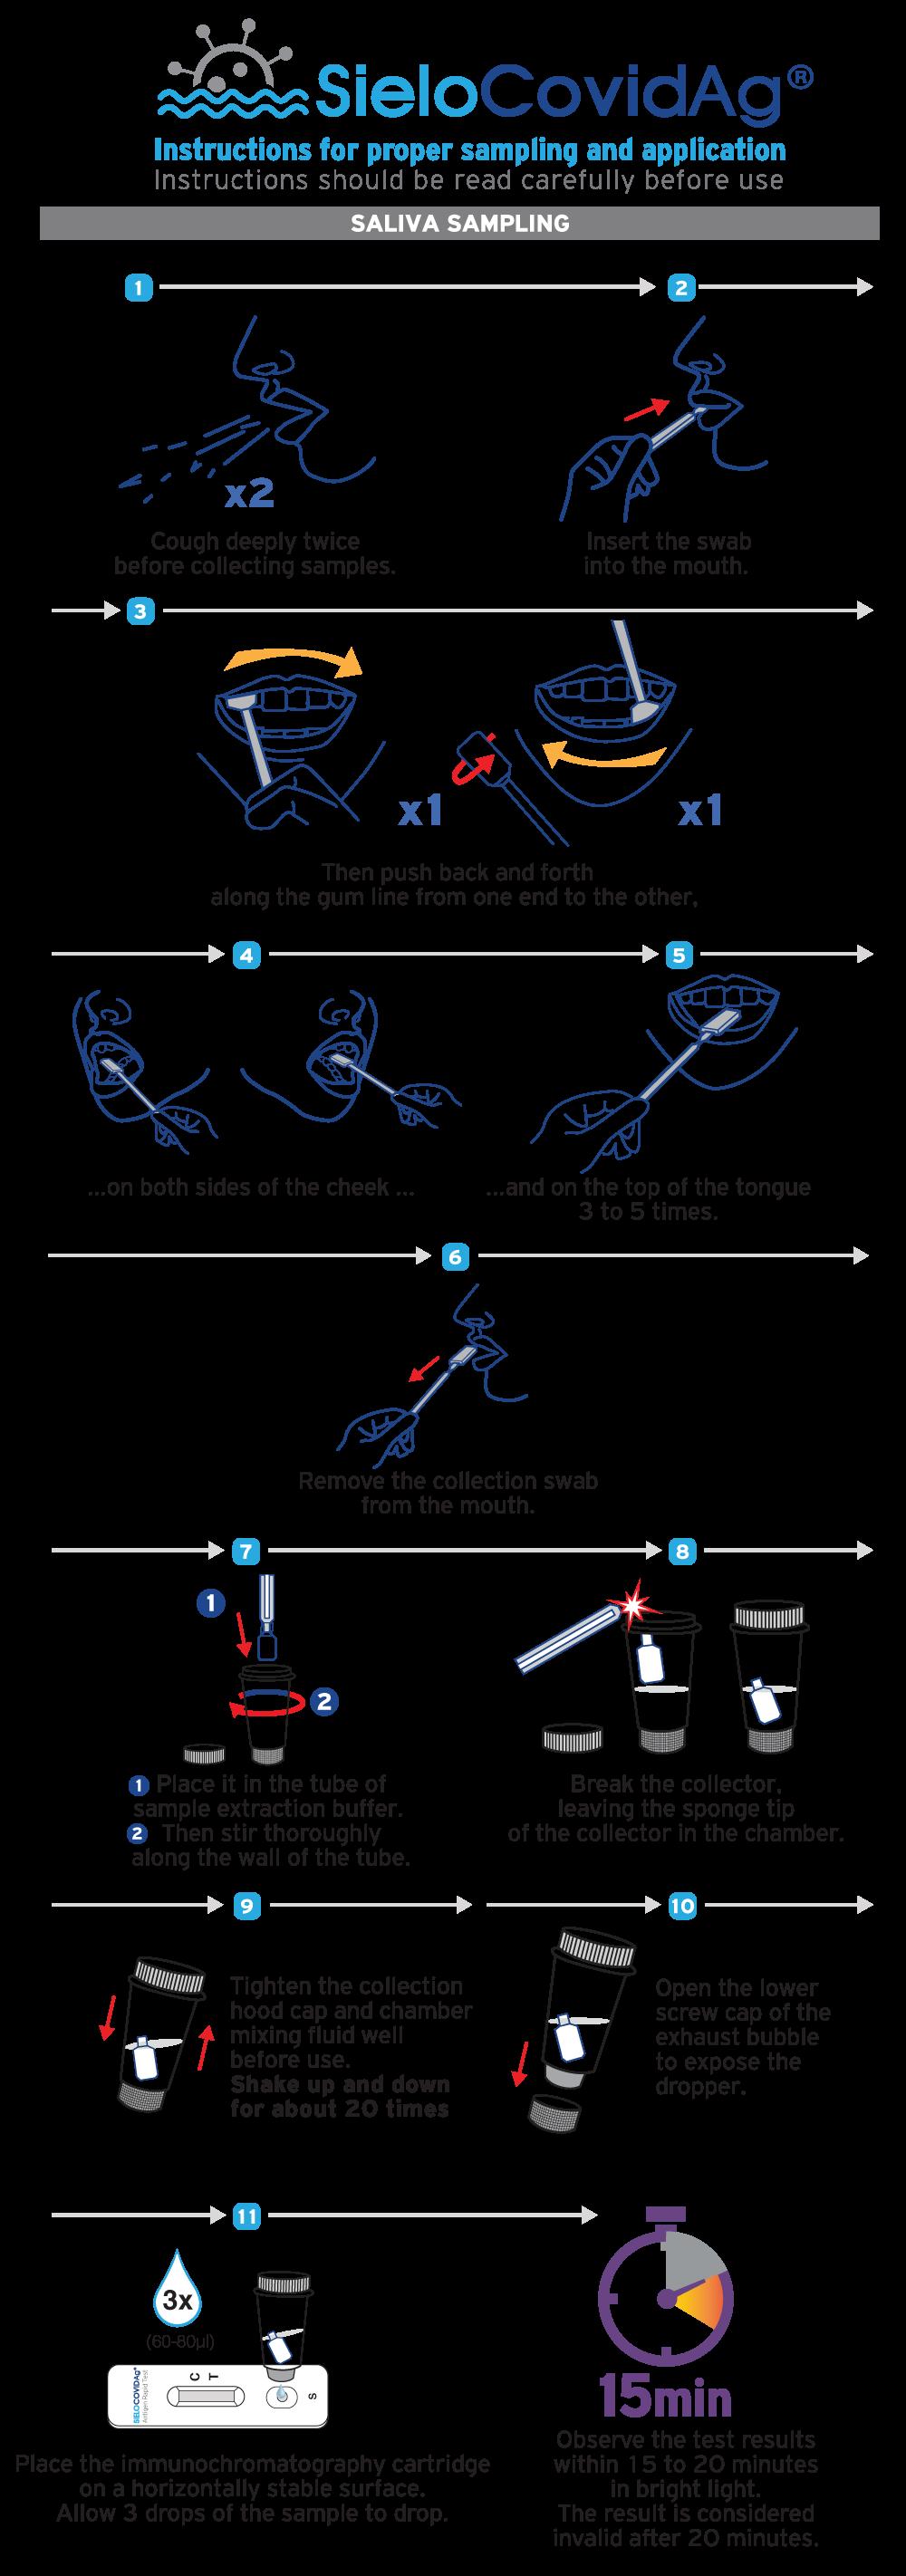 SieloCovidAg® antigen rapid test odigies